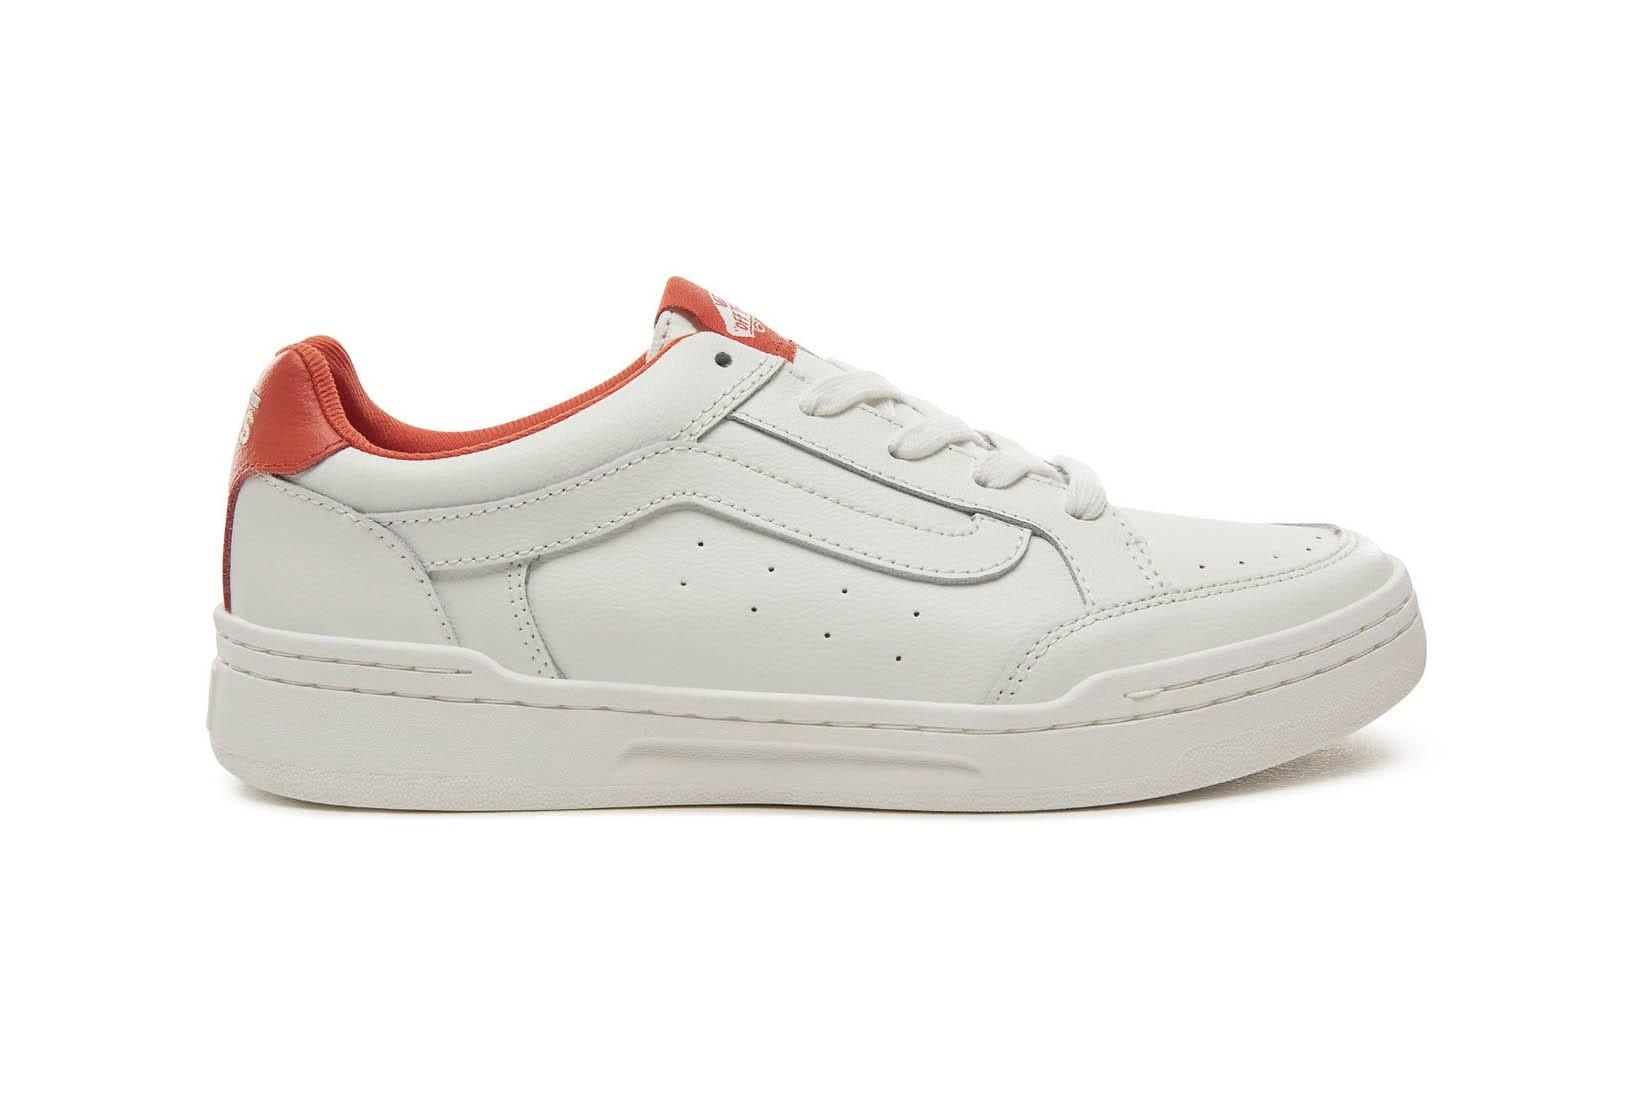 Vans Sporty Highland Sneaker Zephyr